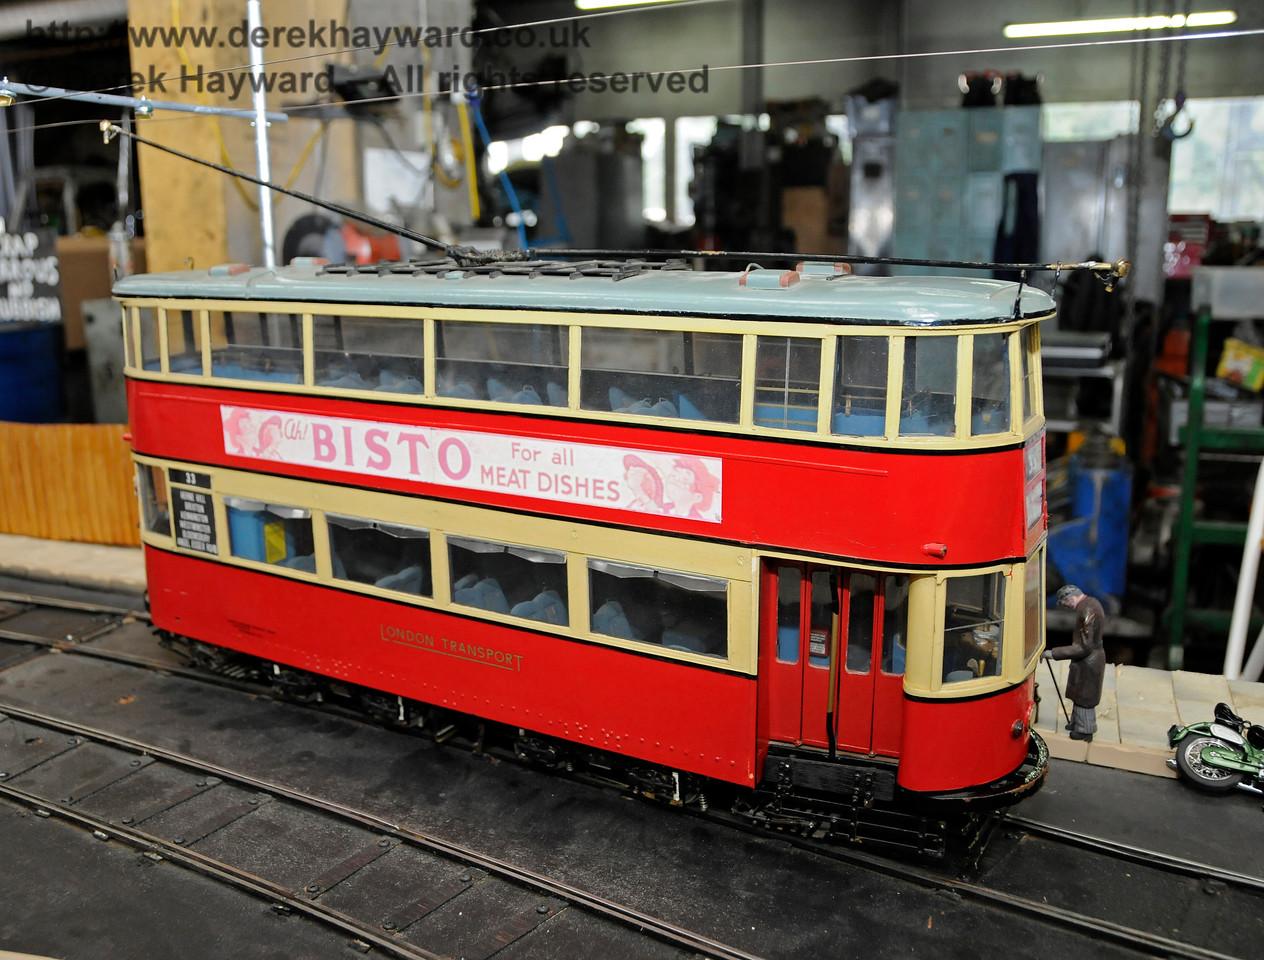 Model Railway Weekend 250517 17447 E